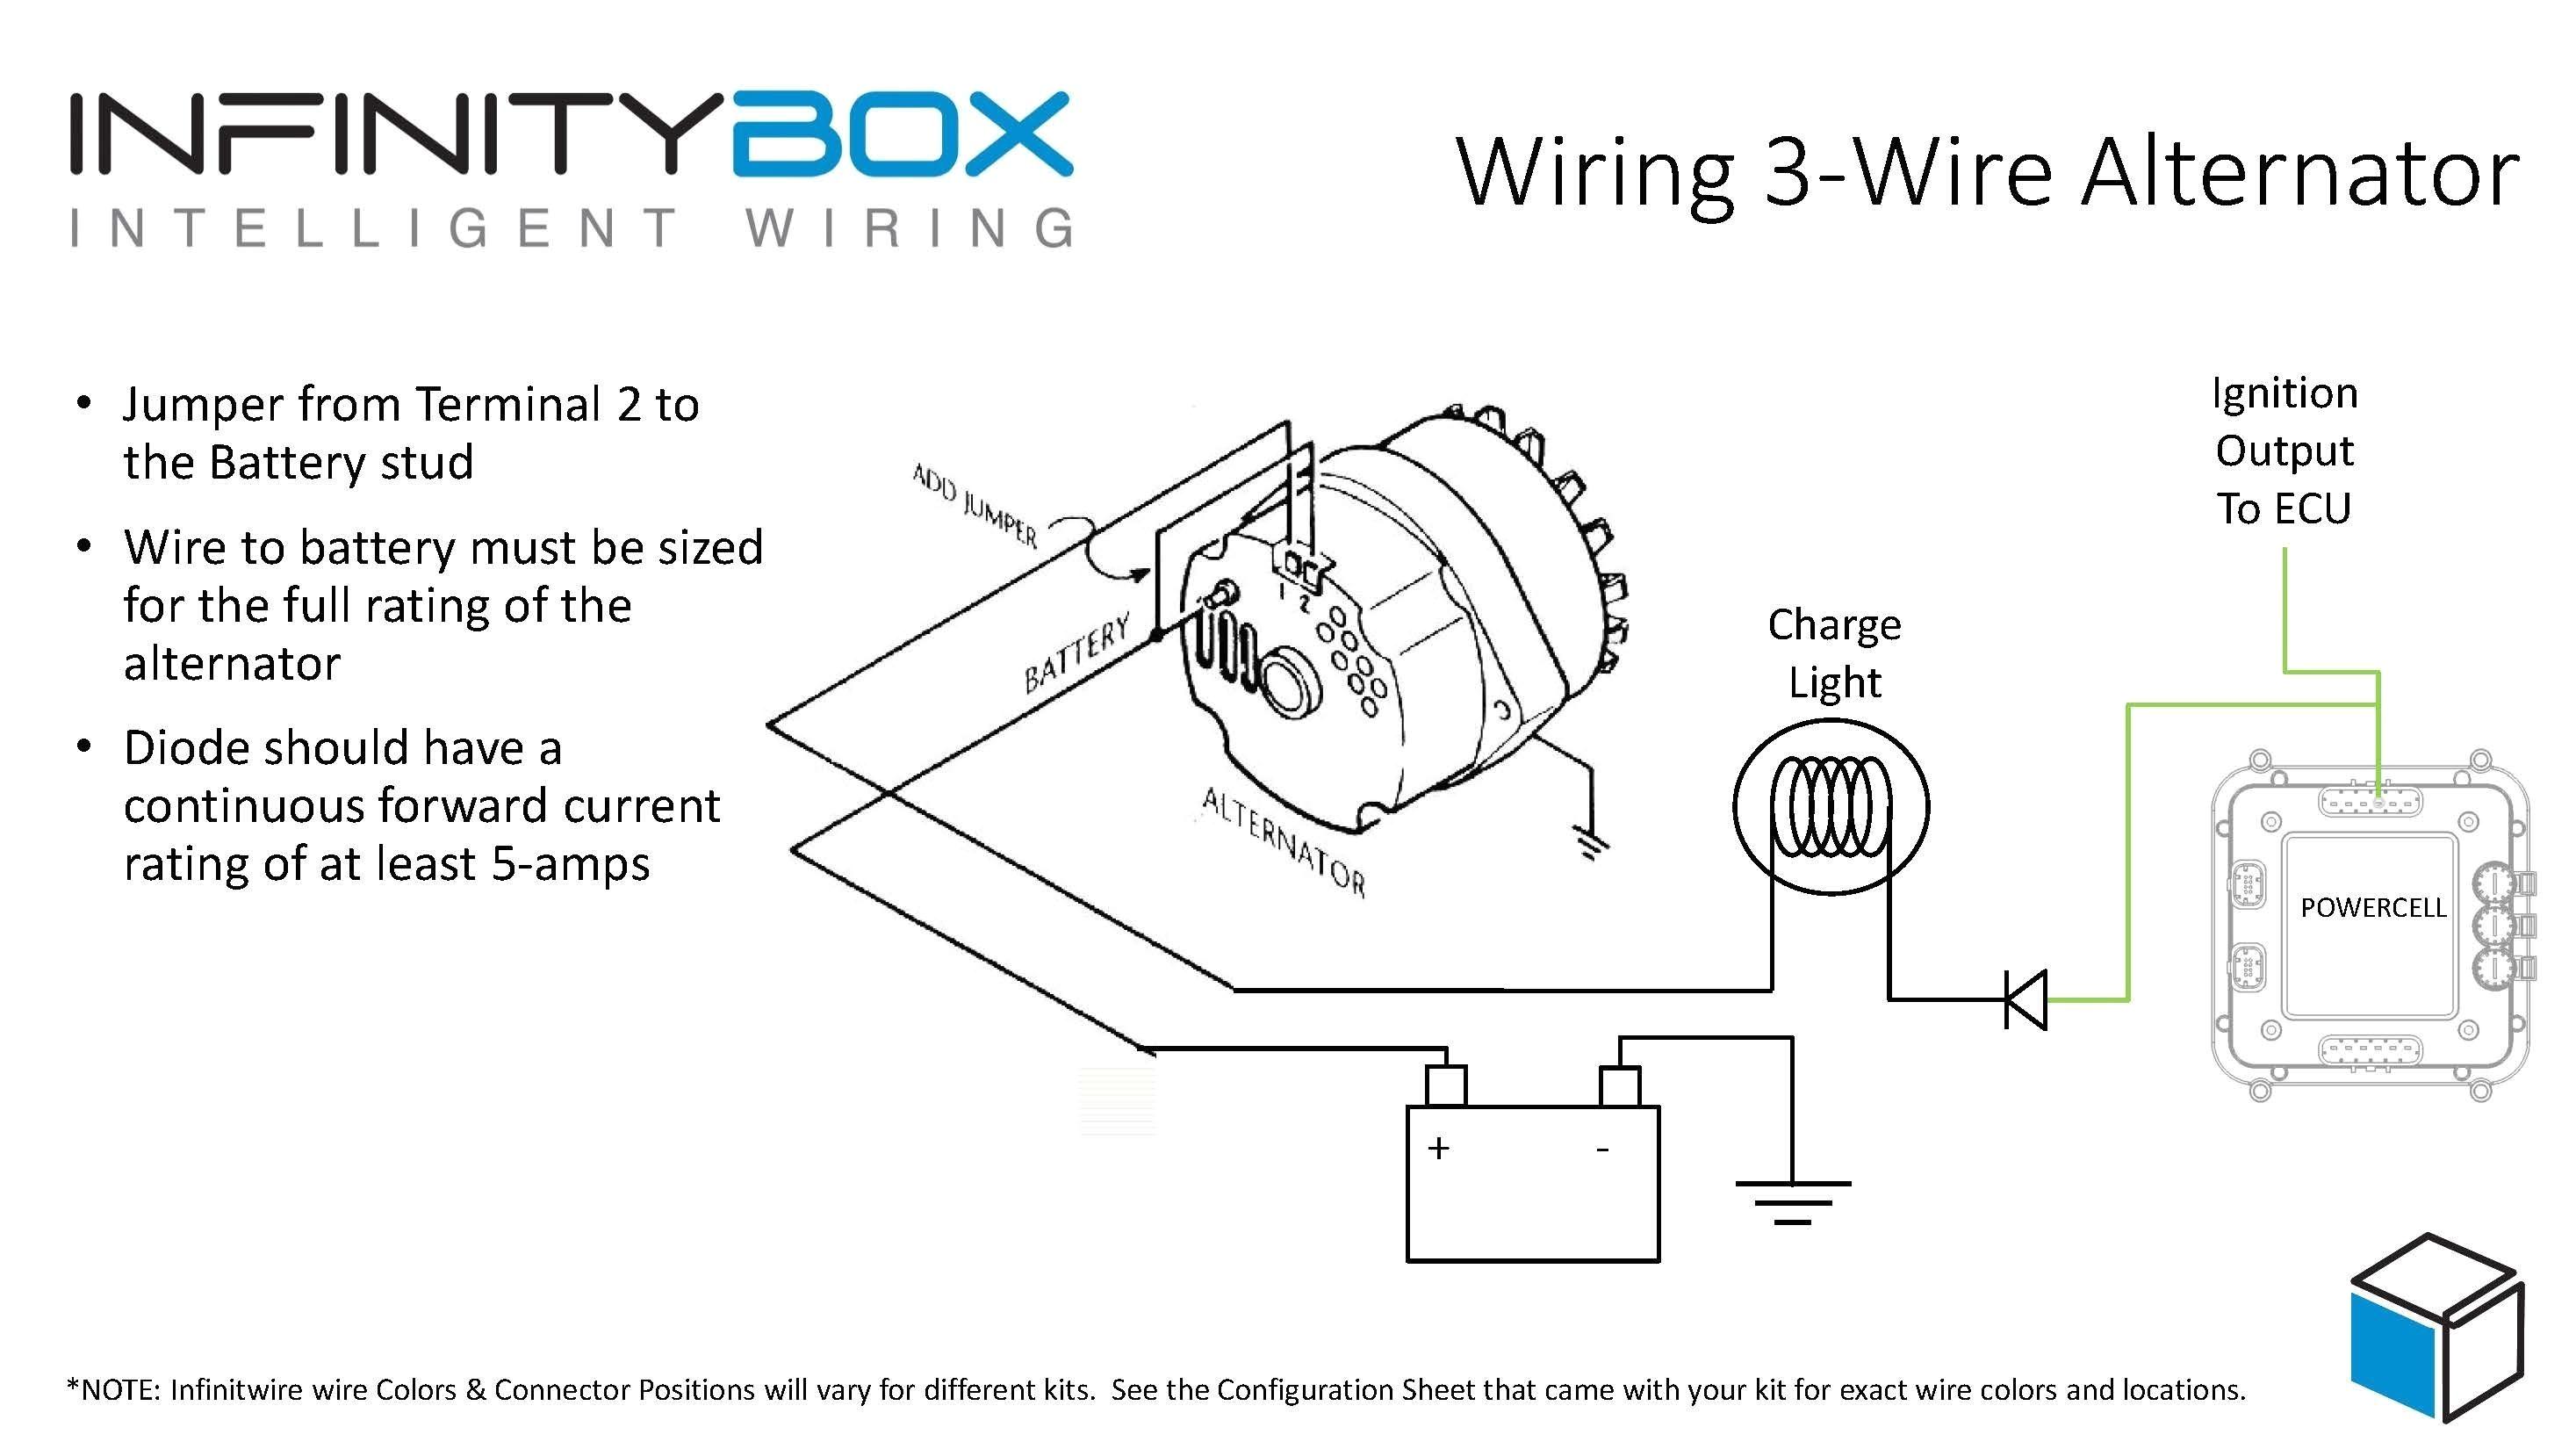 bmw alternator wiring wiring diagram world e36 alternator wiring diagram bmw alternator wiring wiring diagram list